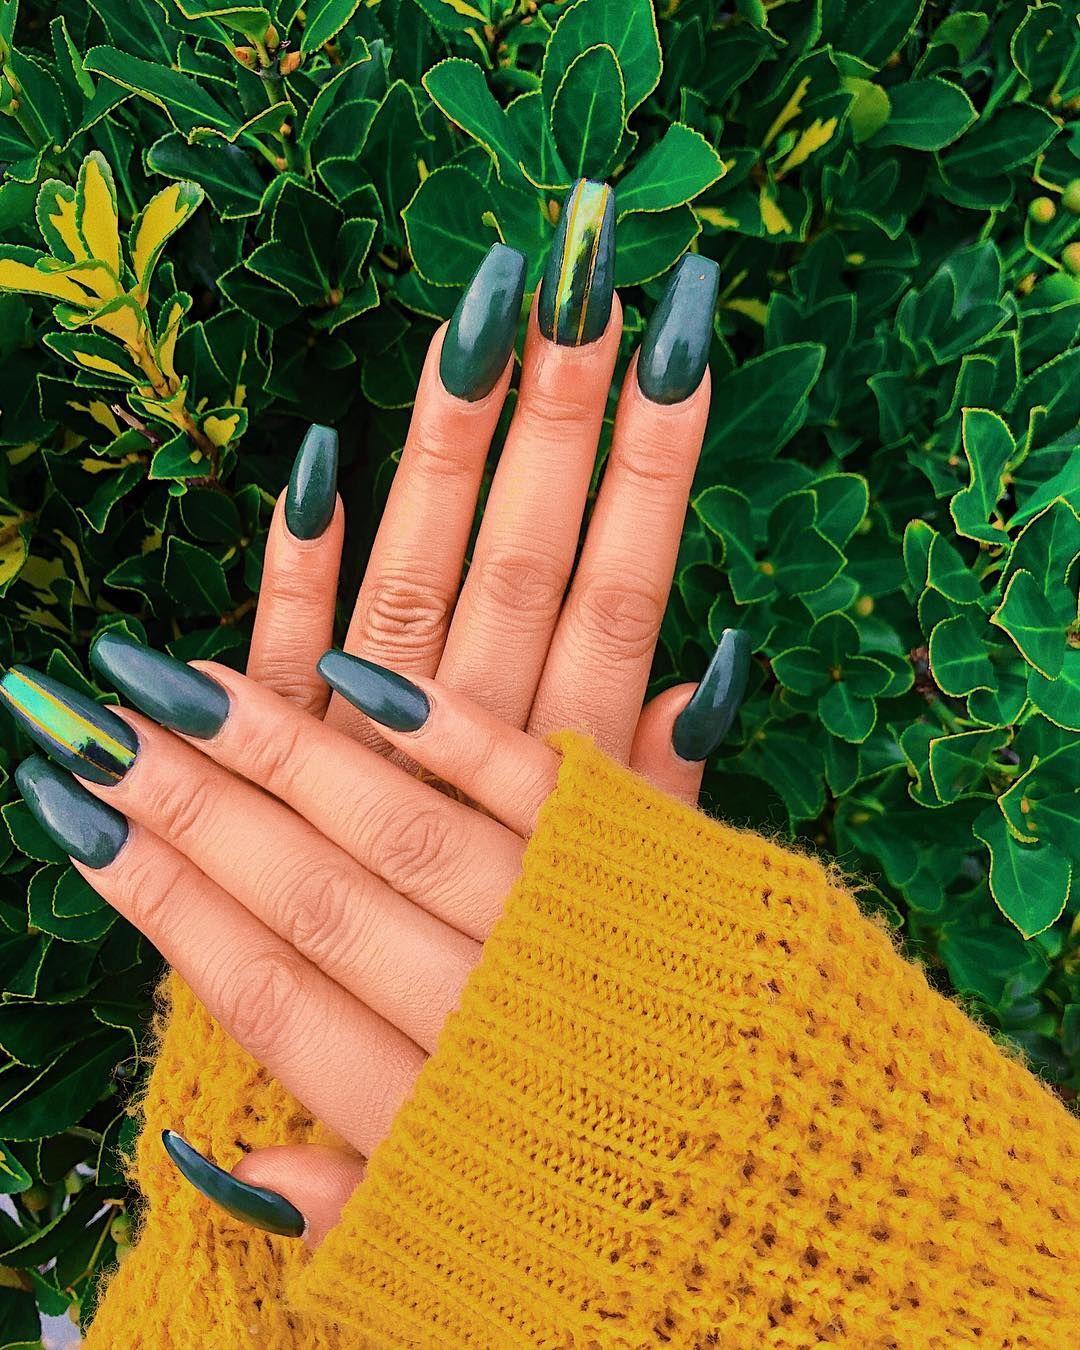 Dark Green Coffin Nails Pinterest Selfcareoverload Dark Green Nails Green Acrylic Nails Black Coffin Nails